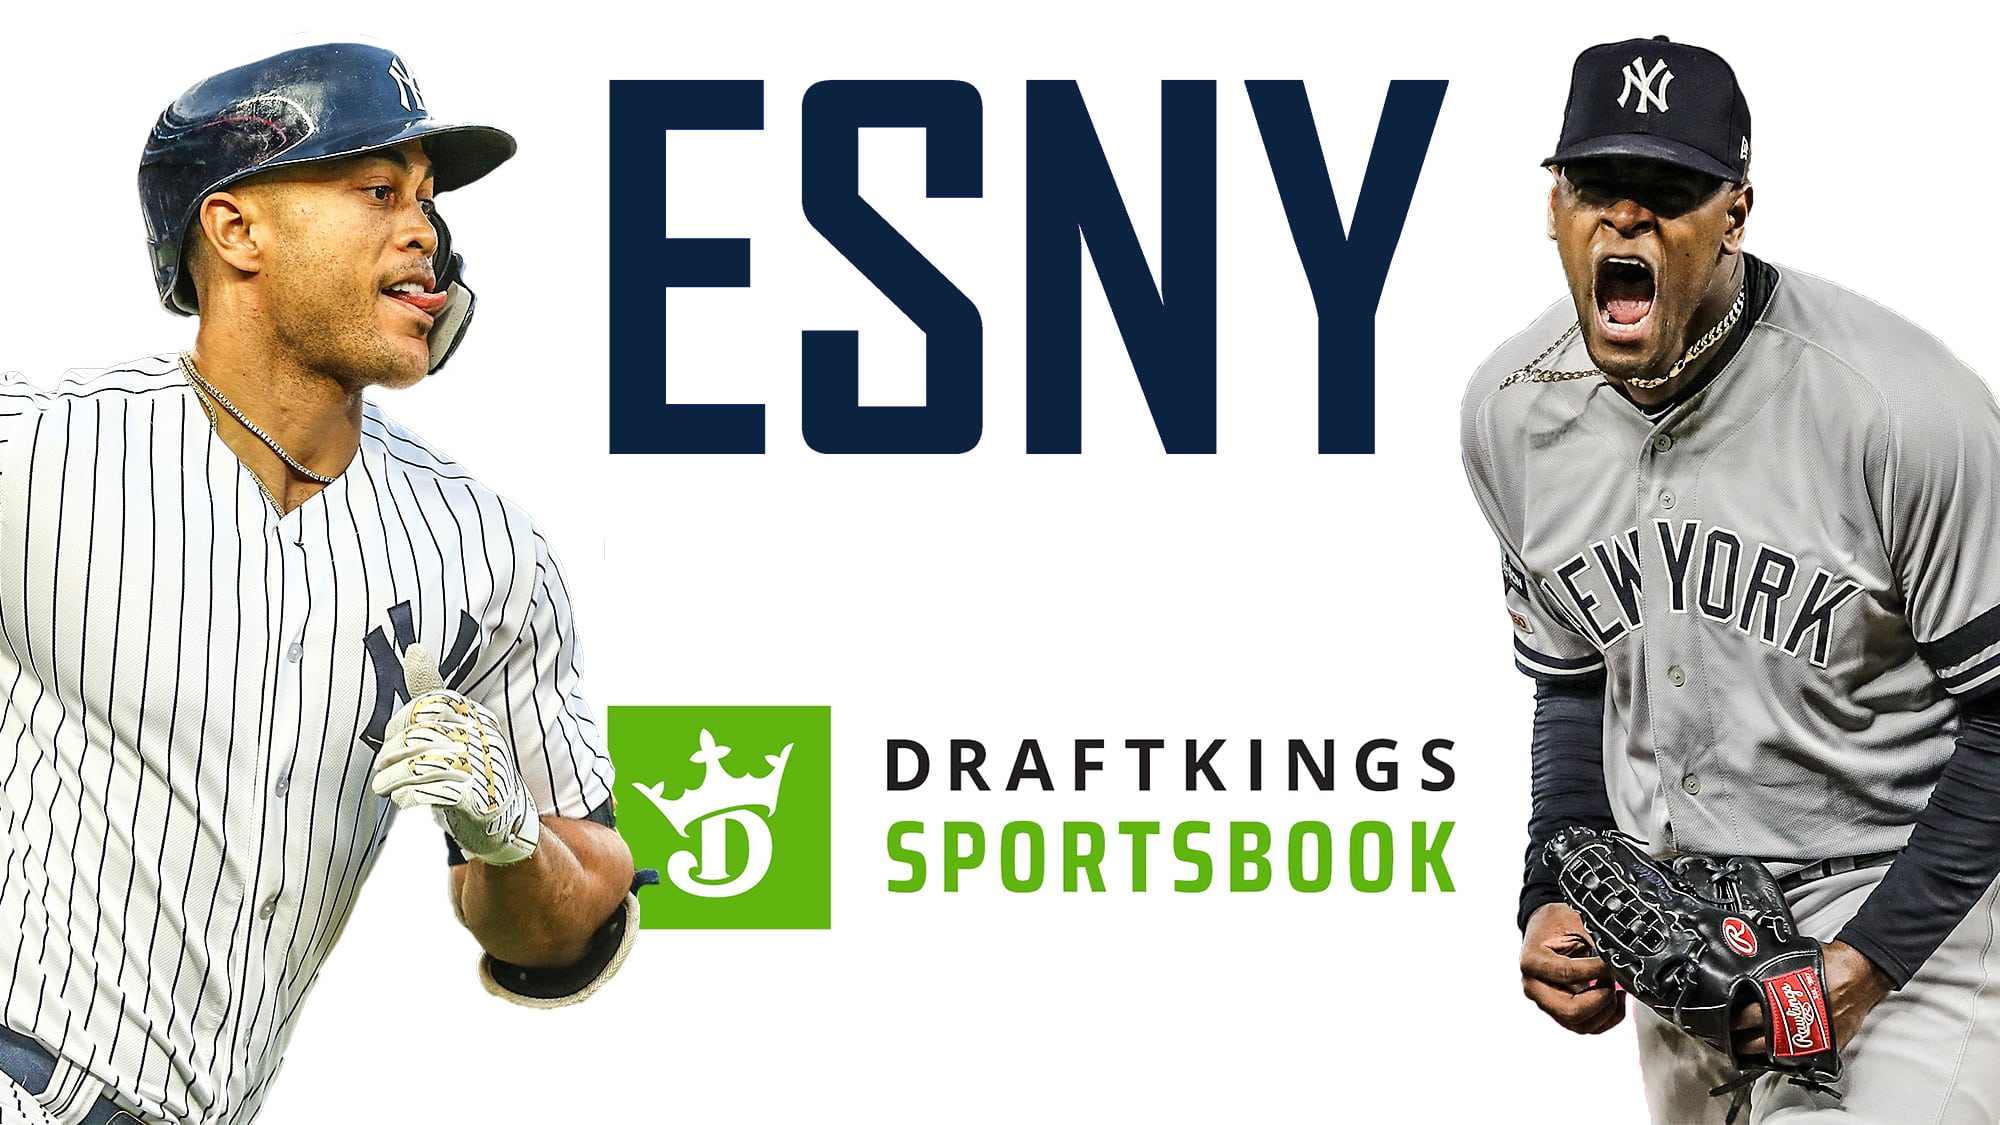 ESNY, DraftKings, MLB 2021 Futures